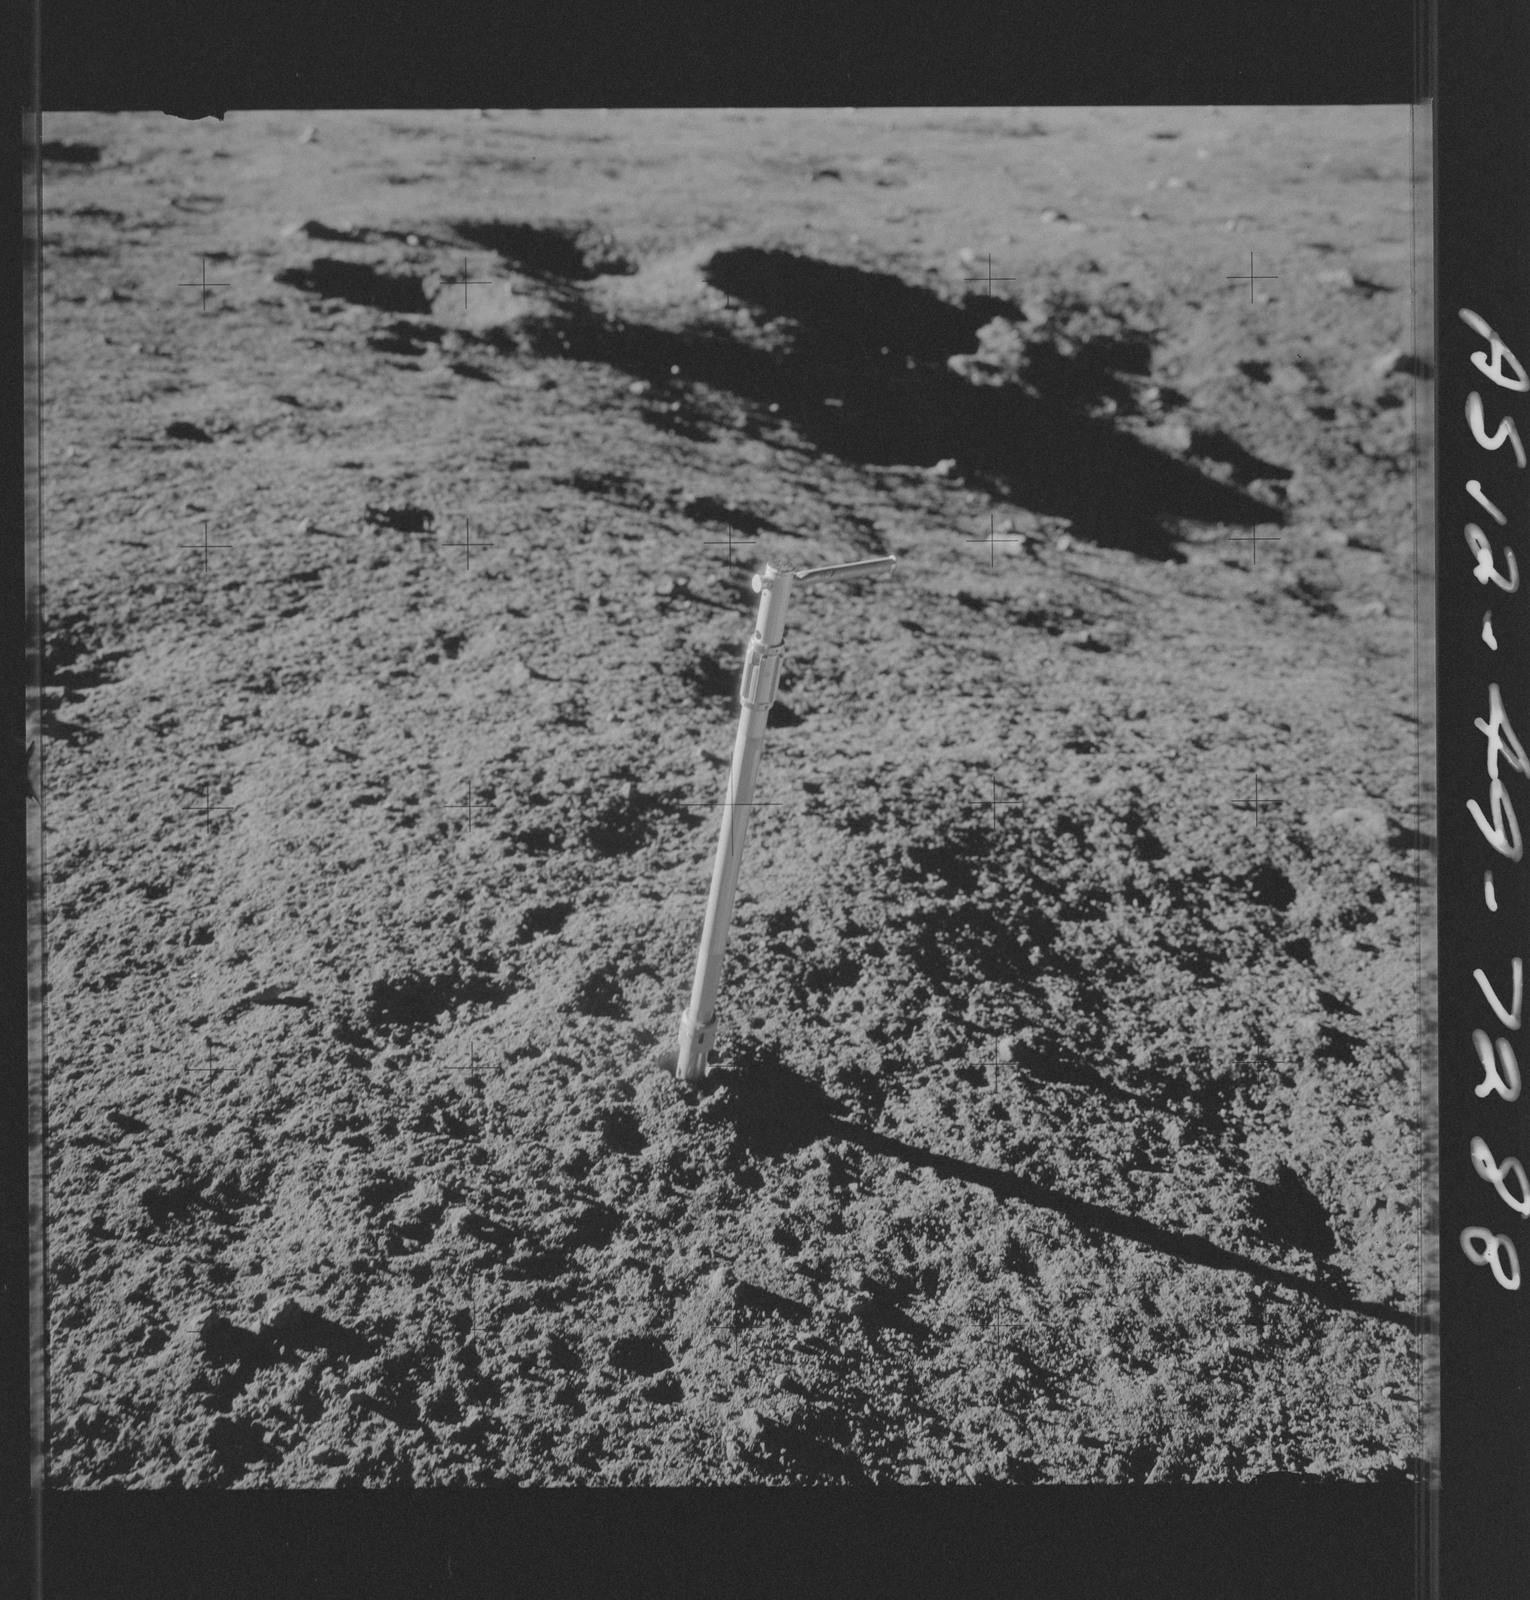 AS12-49-7288 - Apollo 12 - Apollo 12 Mission image  - View of a Core Sampler near Halo Crater